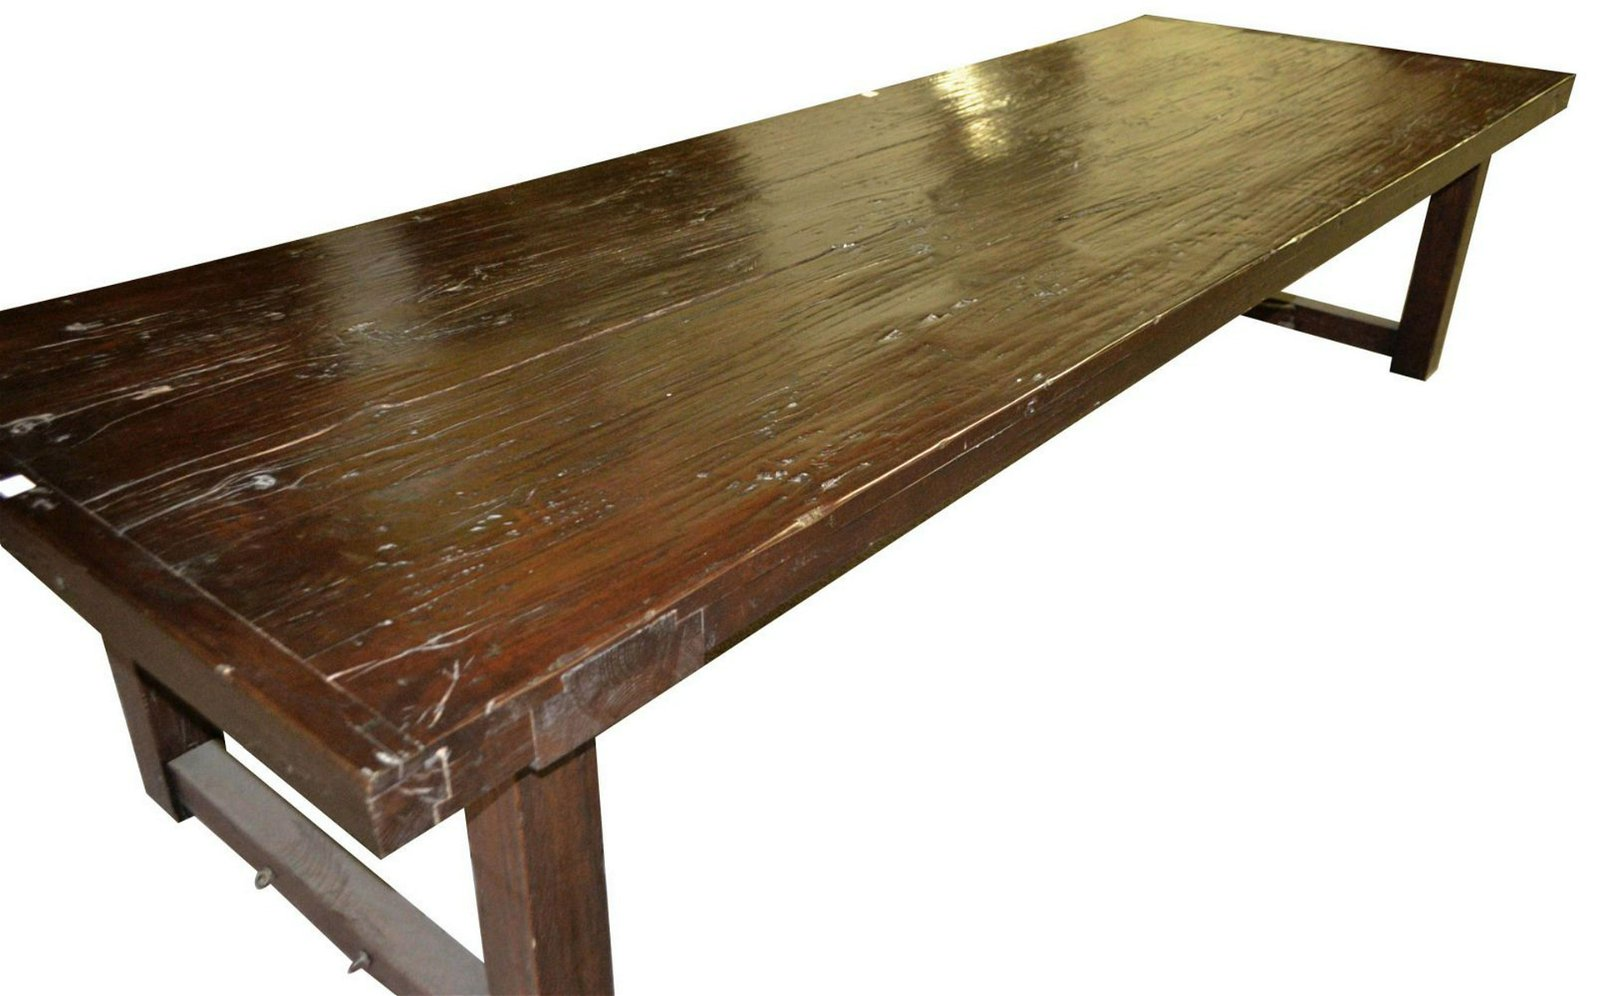 European solid oak dining table